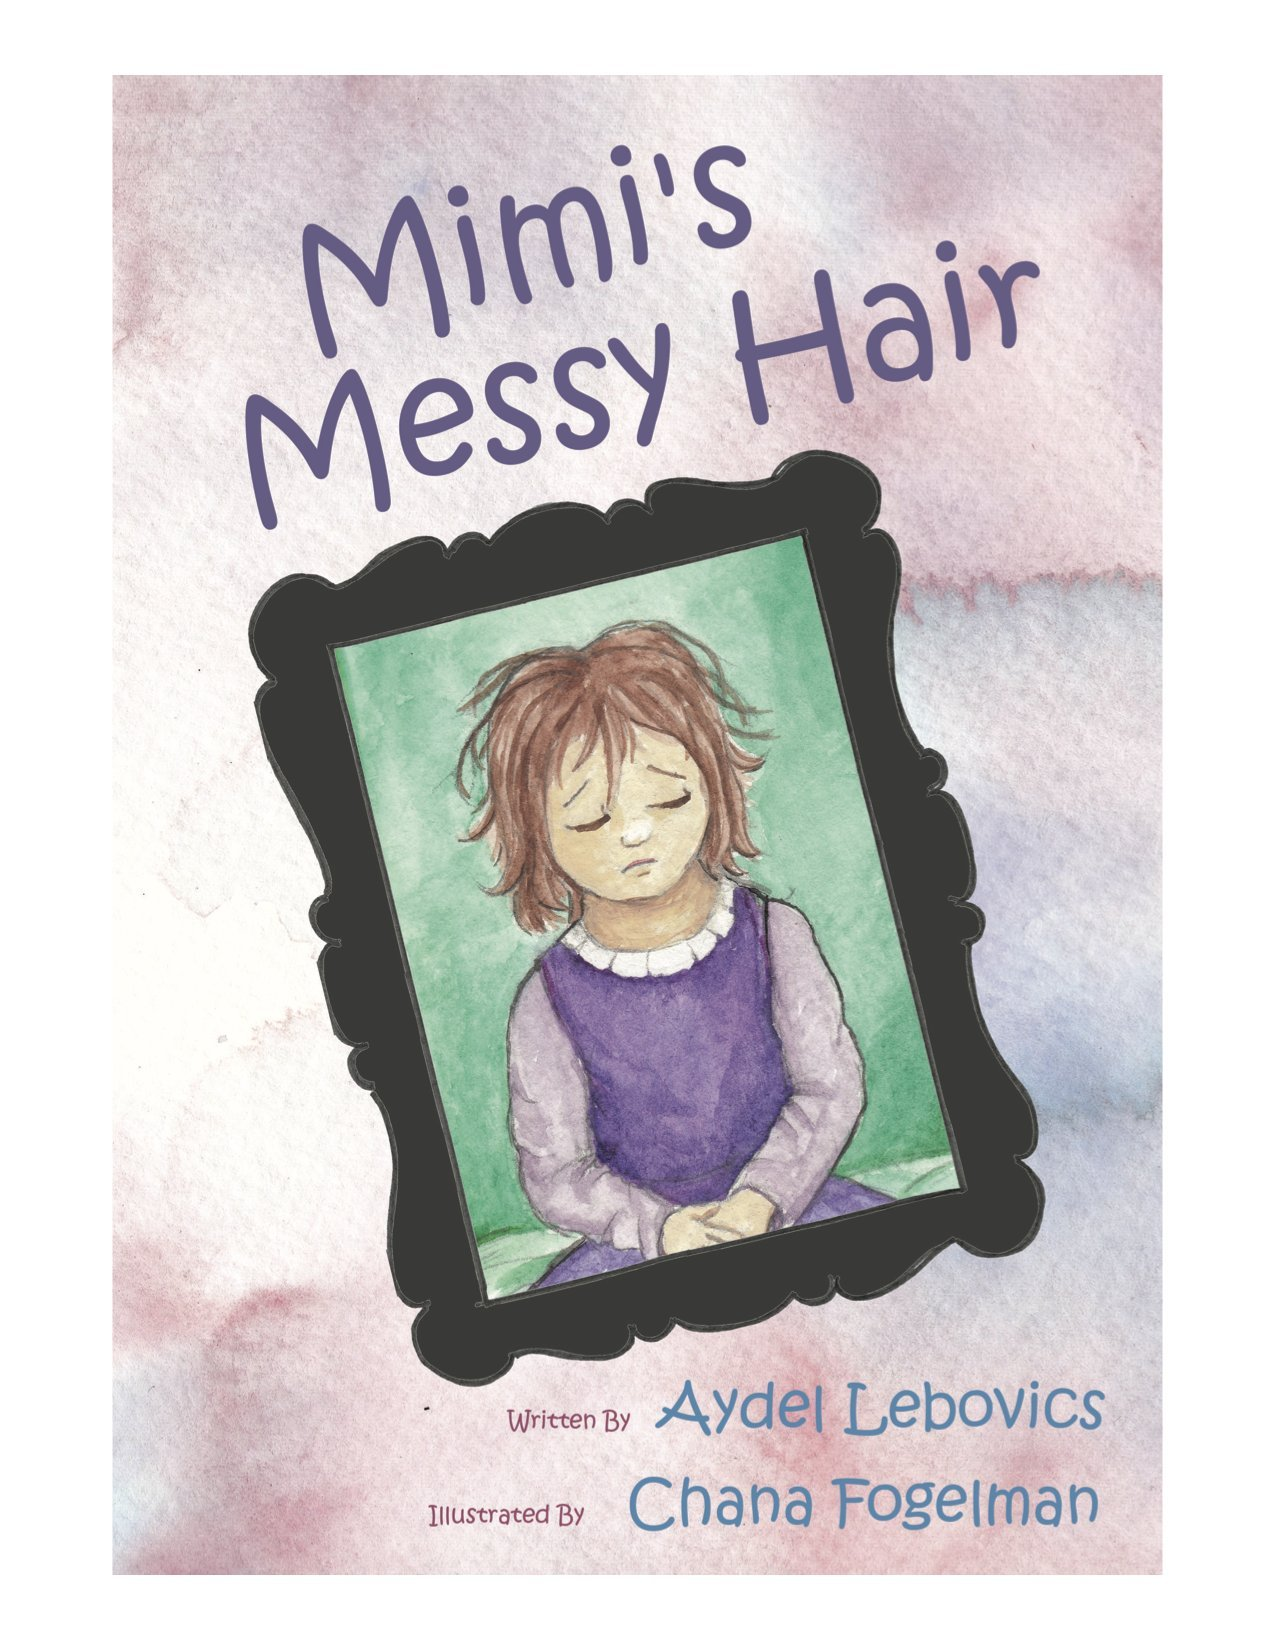 Mimi's Messy Hair